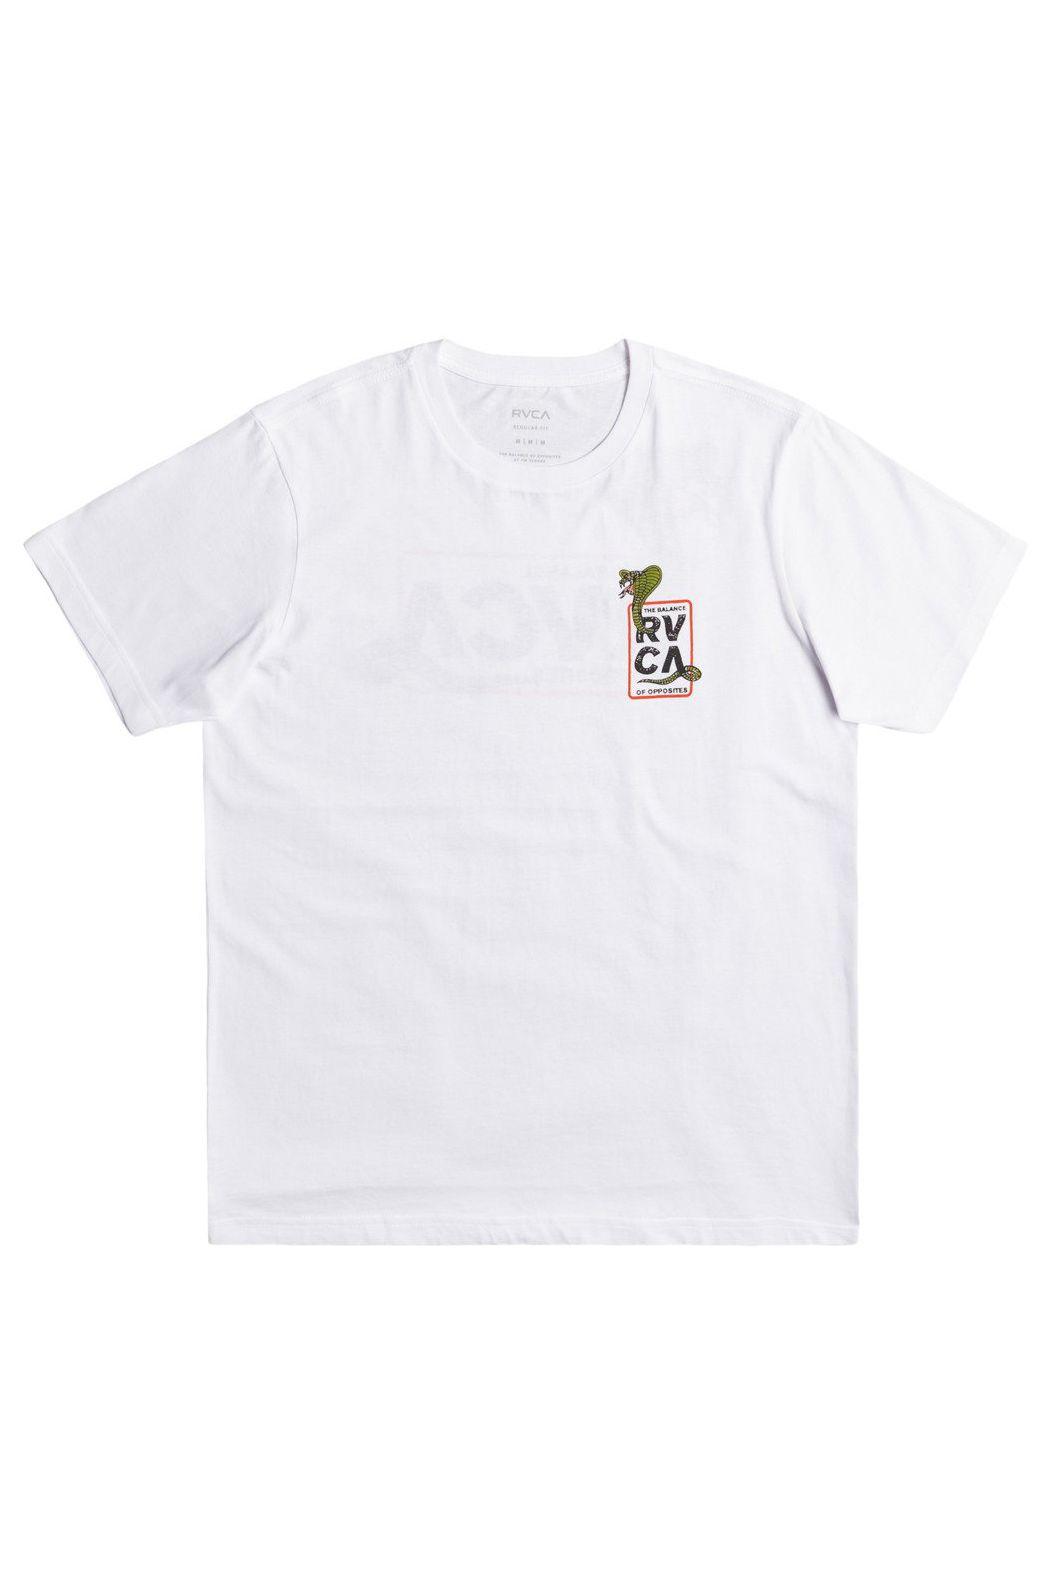 RVCA T-Shirt SNAKE EYES White